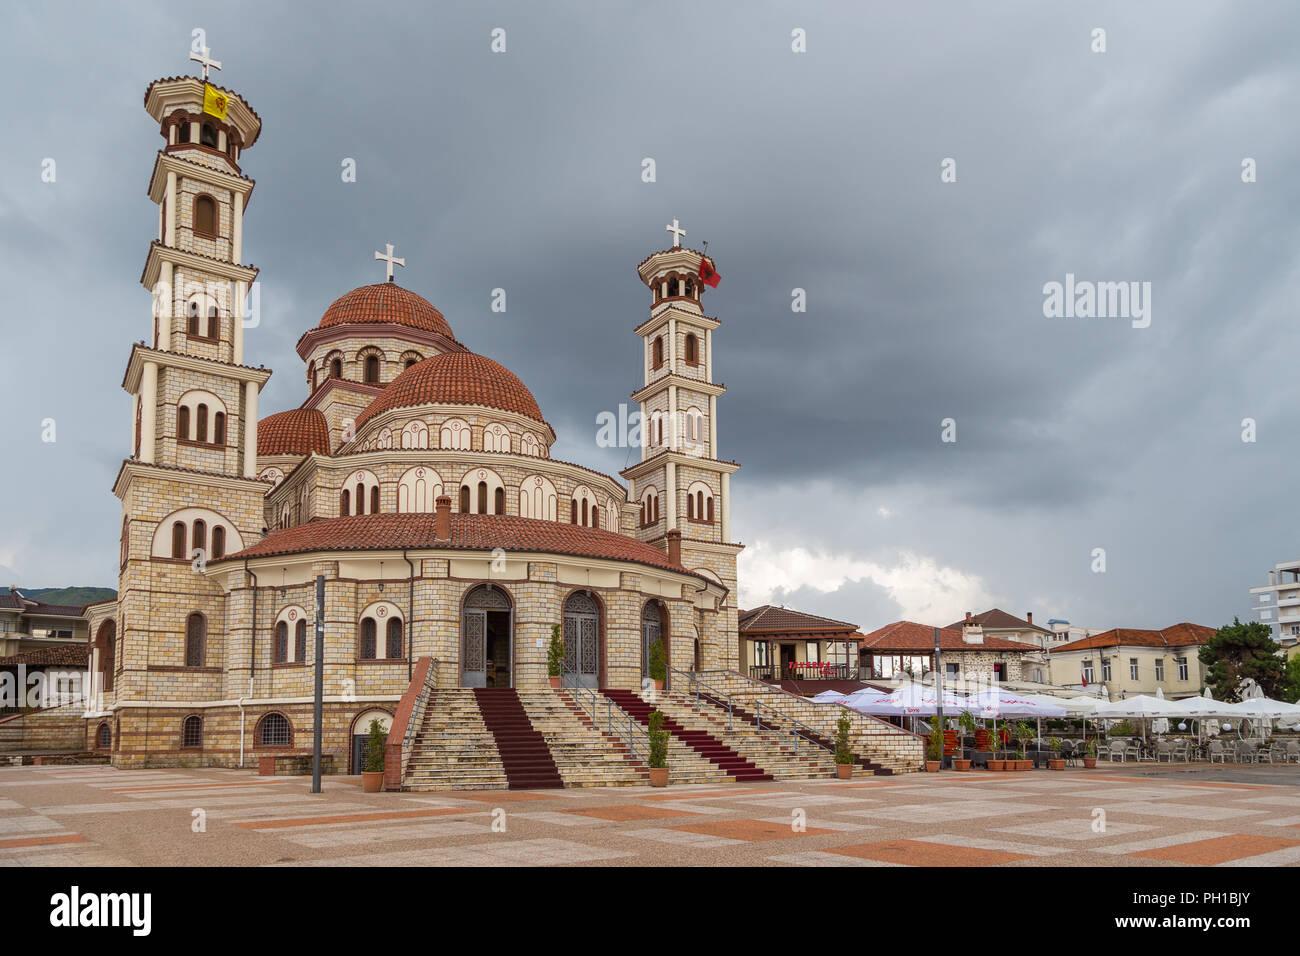 Korce, Albania- 27 June 2014: Resurrection of Christ Orthodox Cathedral of Korce, the main orthodox church. Korce, big town in southeastern Albania su - Stock Image